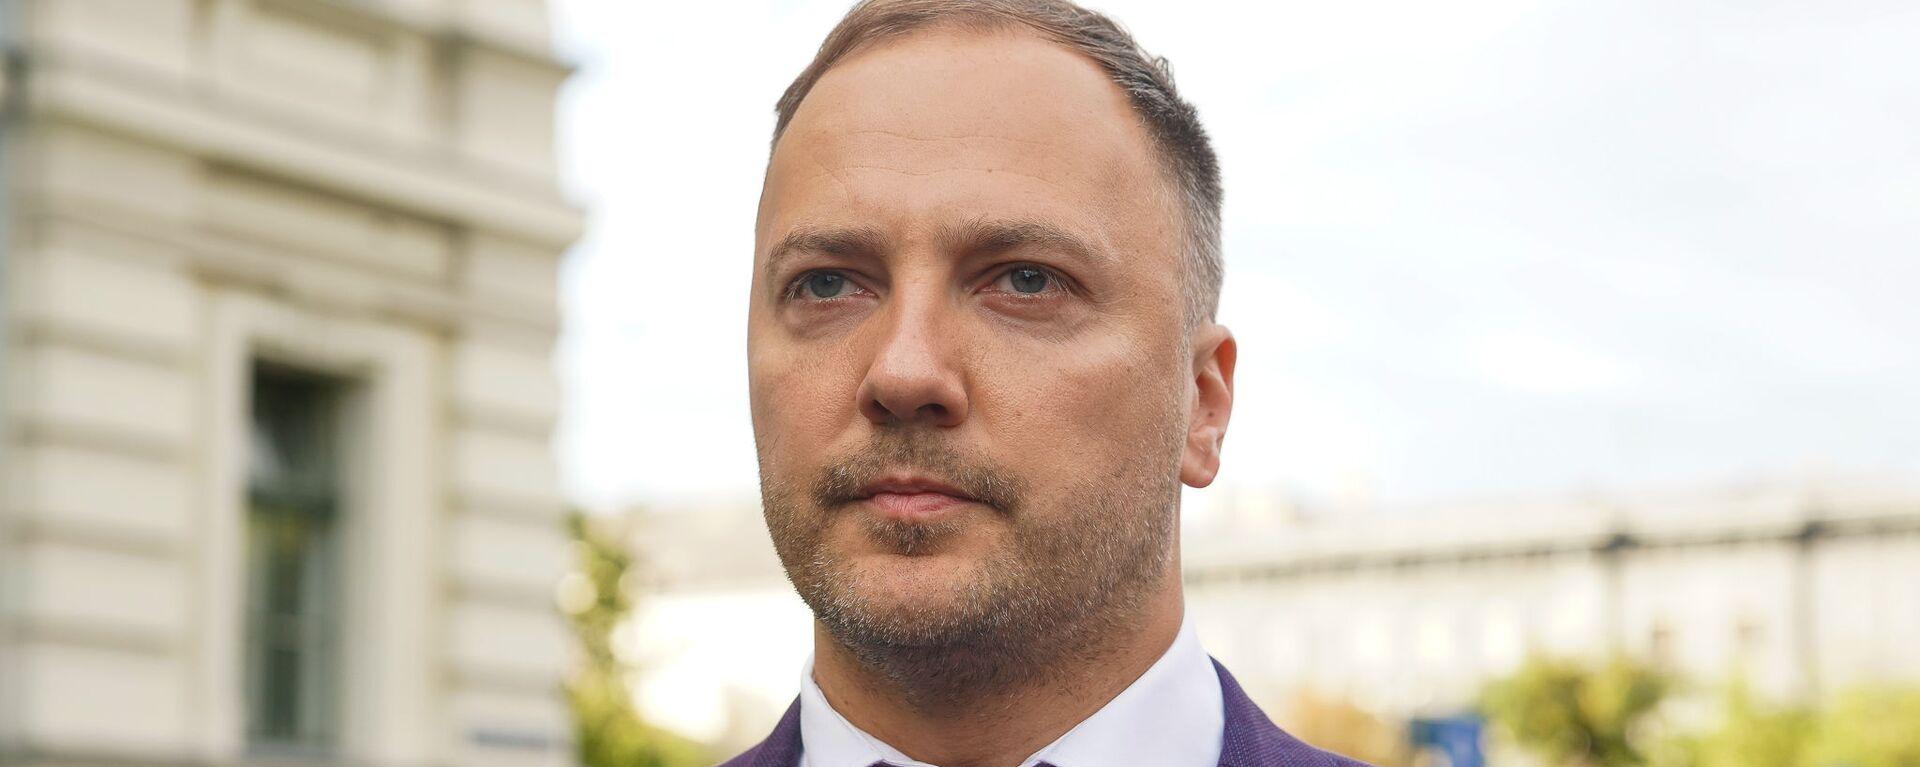 Министр внутренних дел Сандис Гиргенс - Sputnik Латвия, 1920, 12.08.2021